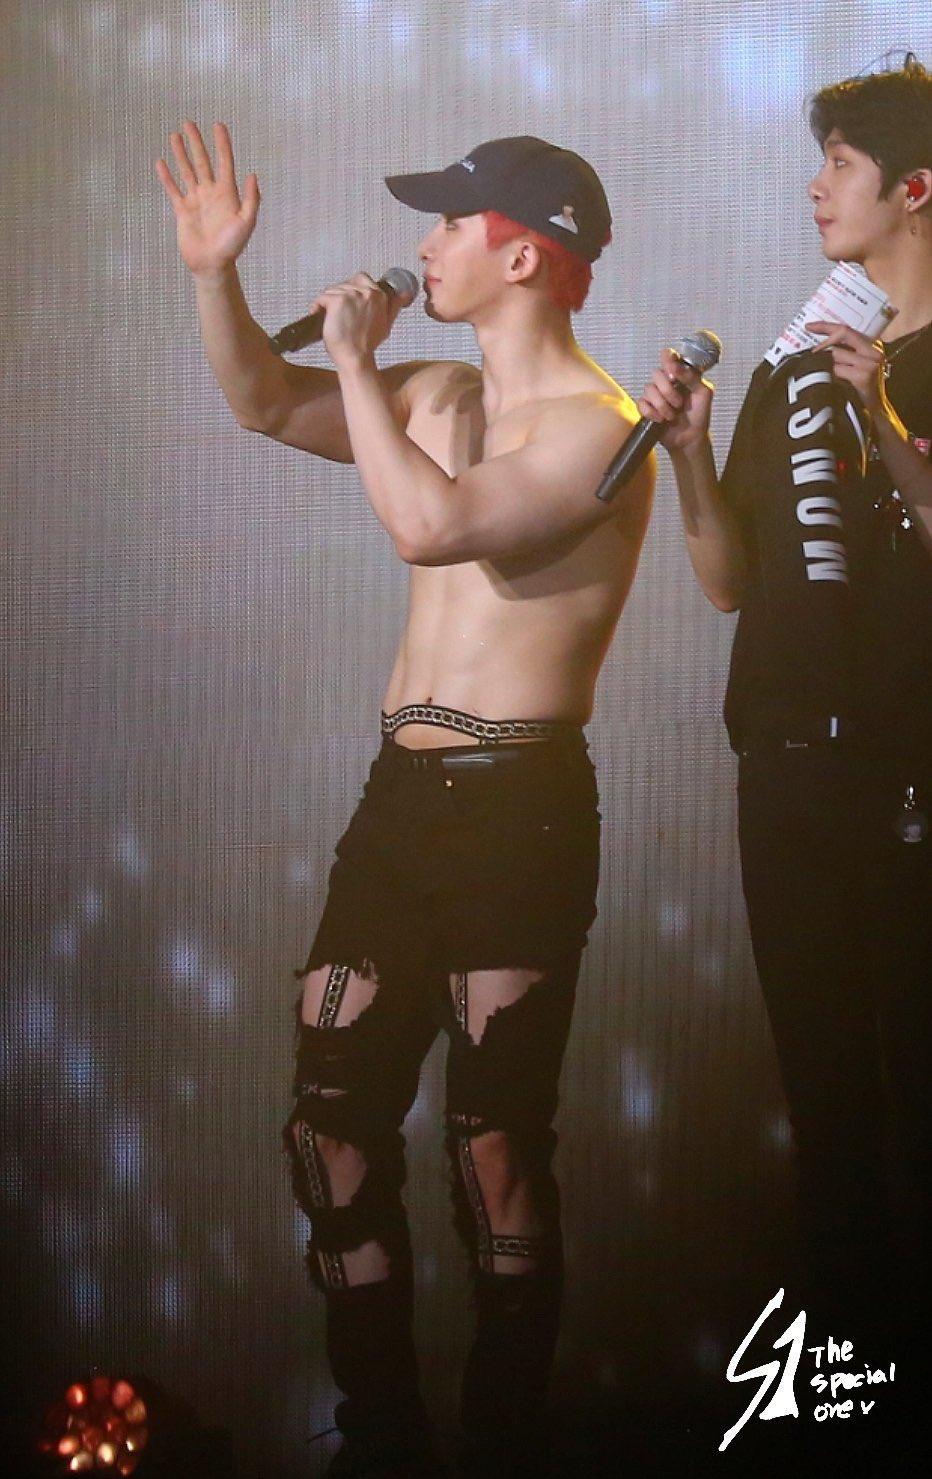 Wonho monsta x, wonho abs, wonho fashion, wonho 2019, wonho concert